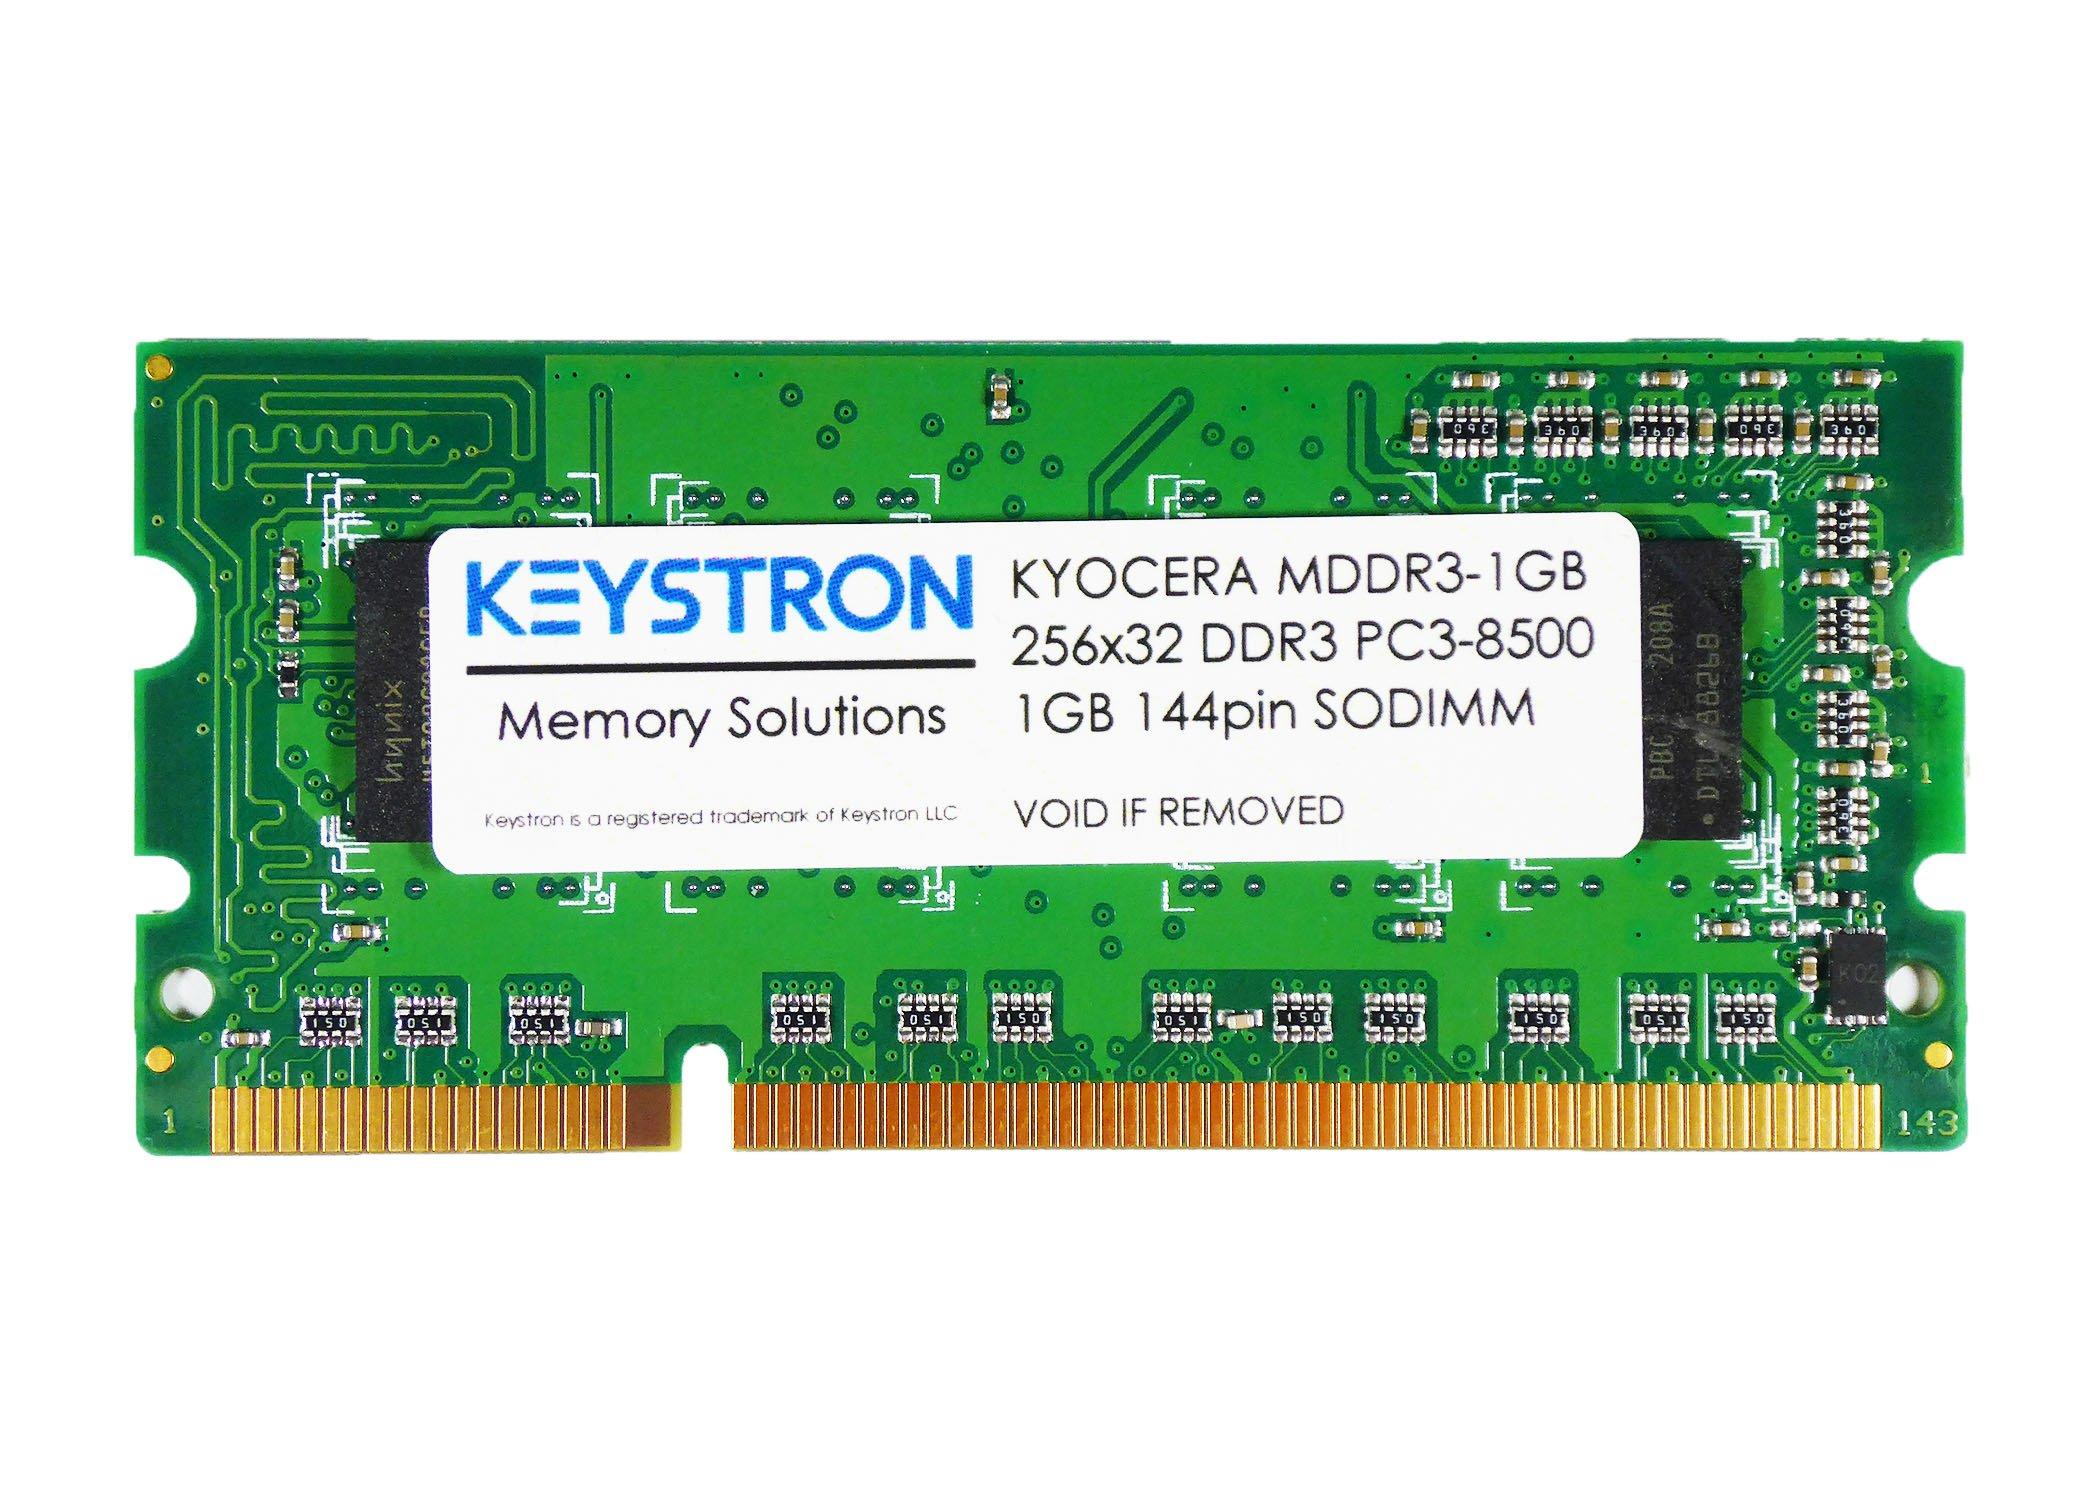 MDDR3-1GB 1GB Memory Upgrade for Kyocera ECOSYS M6026cdn/cidn, M6526cdn/cidn, P6021cdn, P6026cdn, P6030cdn, P7035cdn, P7060cdn Printer